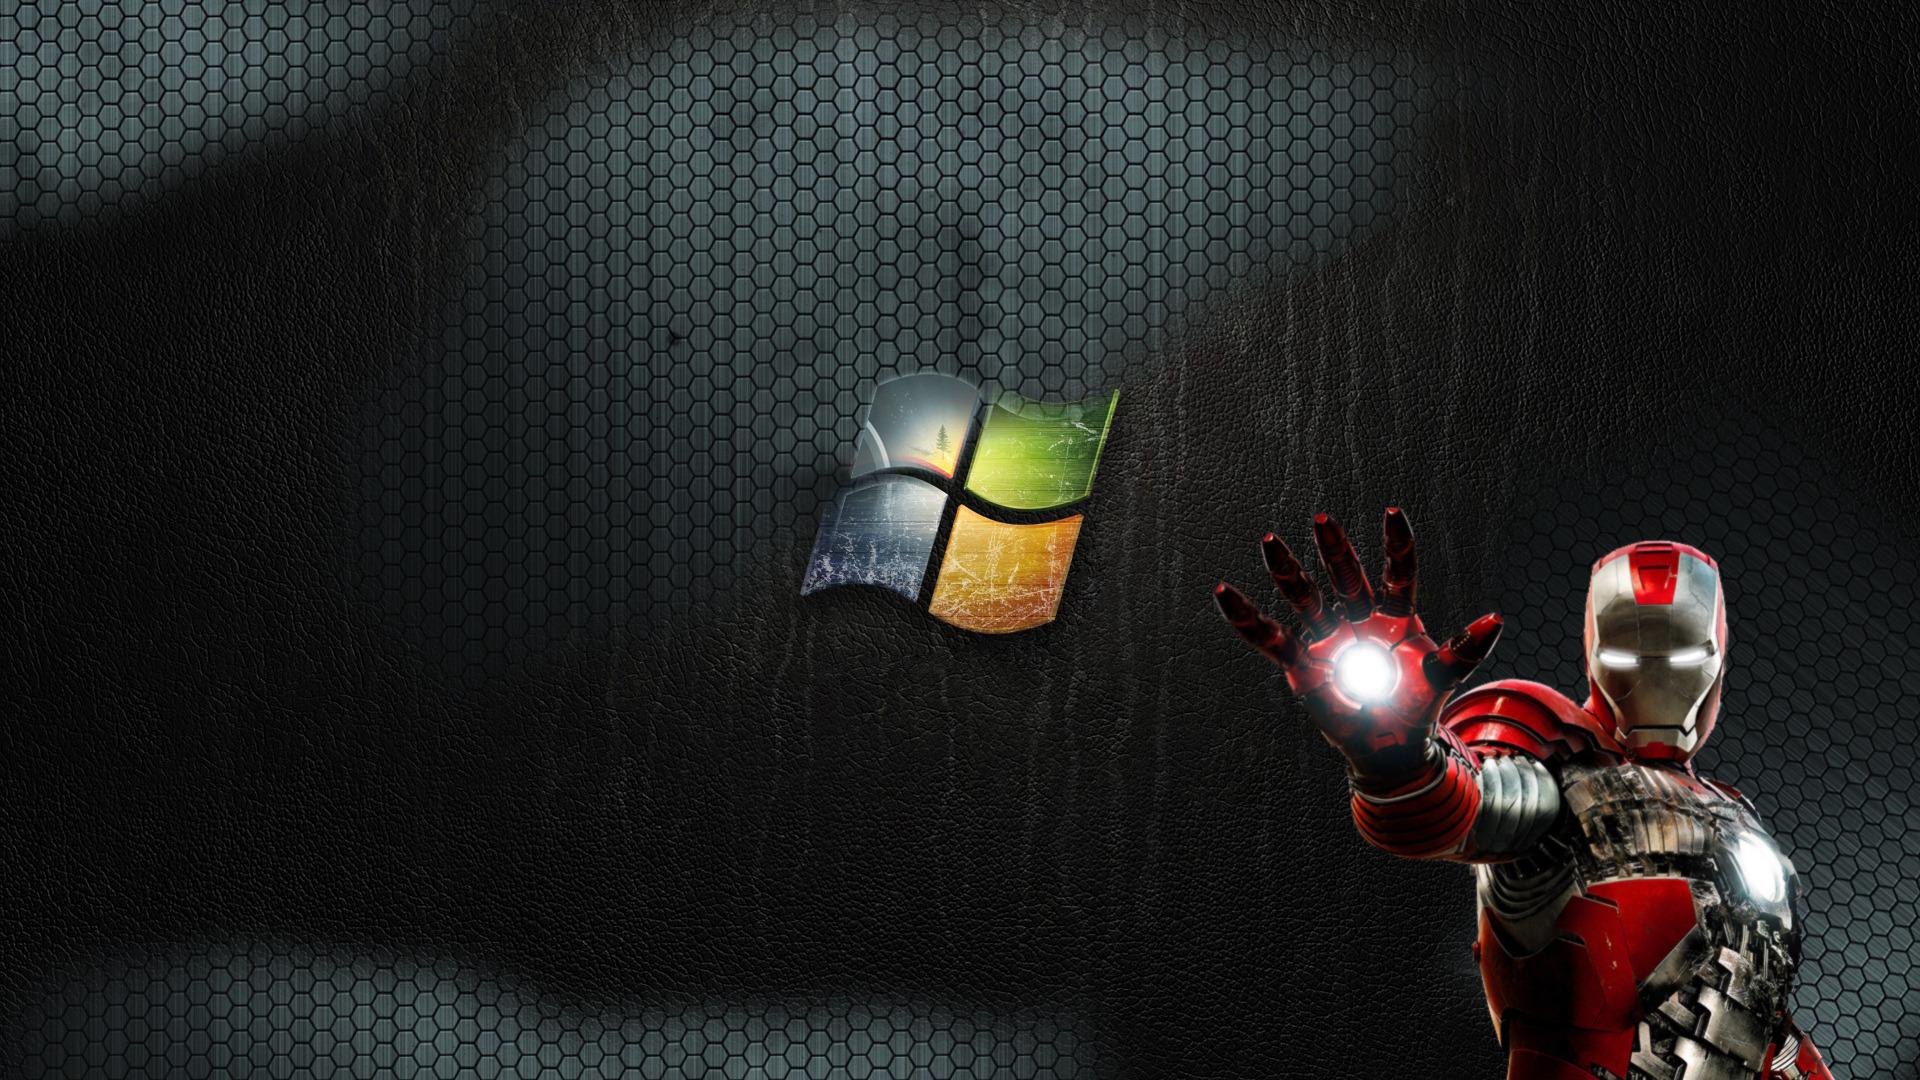 47+ Live Iron Man Wallpaper on WallpaperSafari